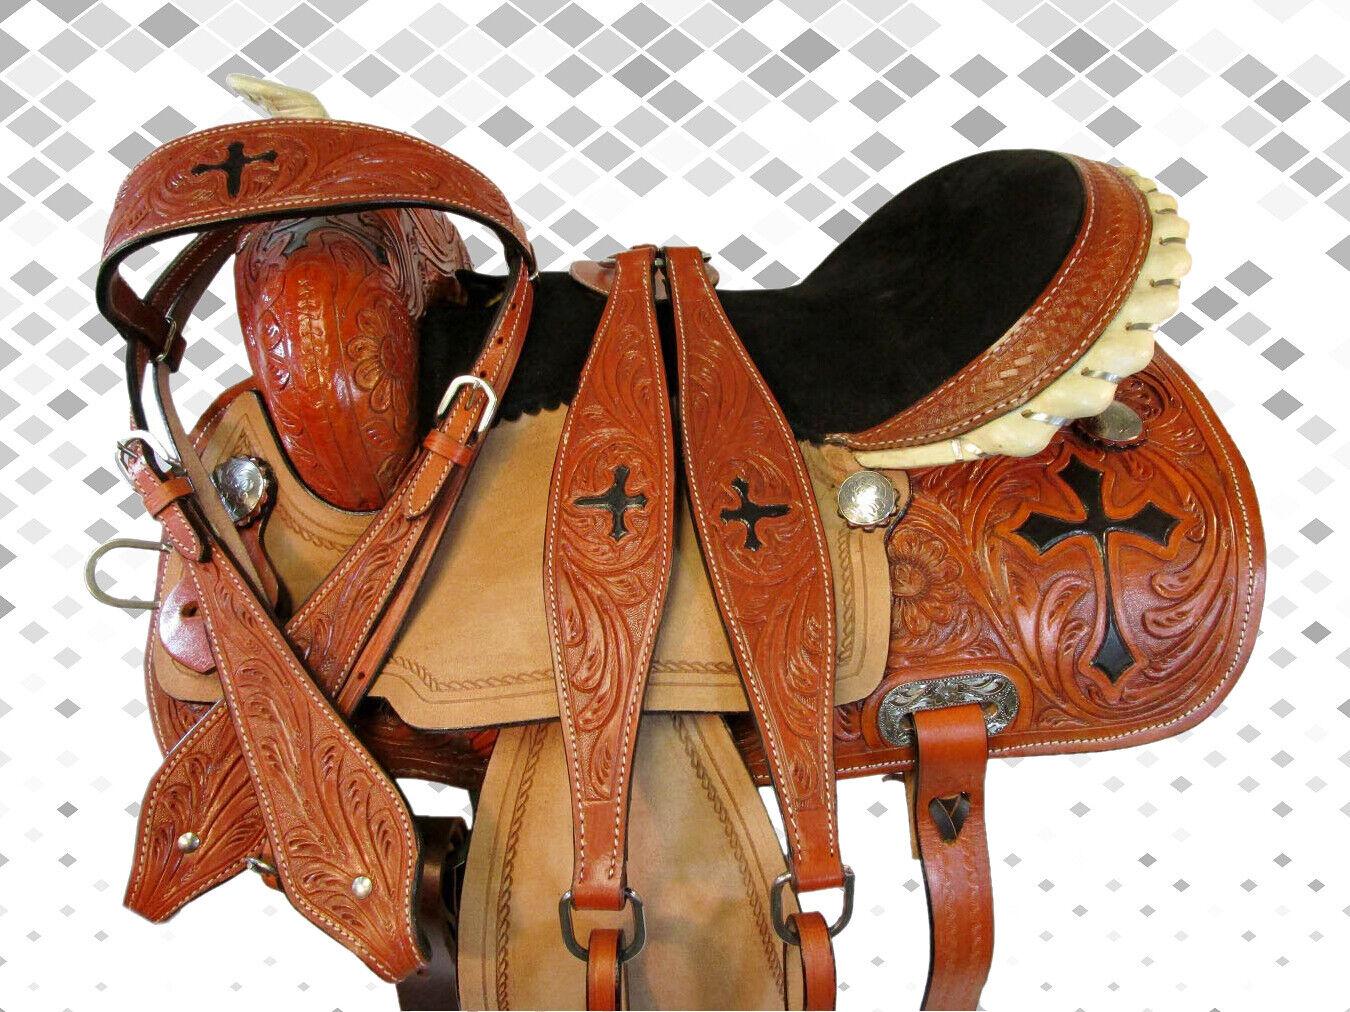 WESTERN USED SADDLE 15 16 PLEASURE HORSE TRAIL CROSS CROSS CROSS TOOLED RODEO BARREL RACING e891f3